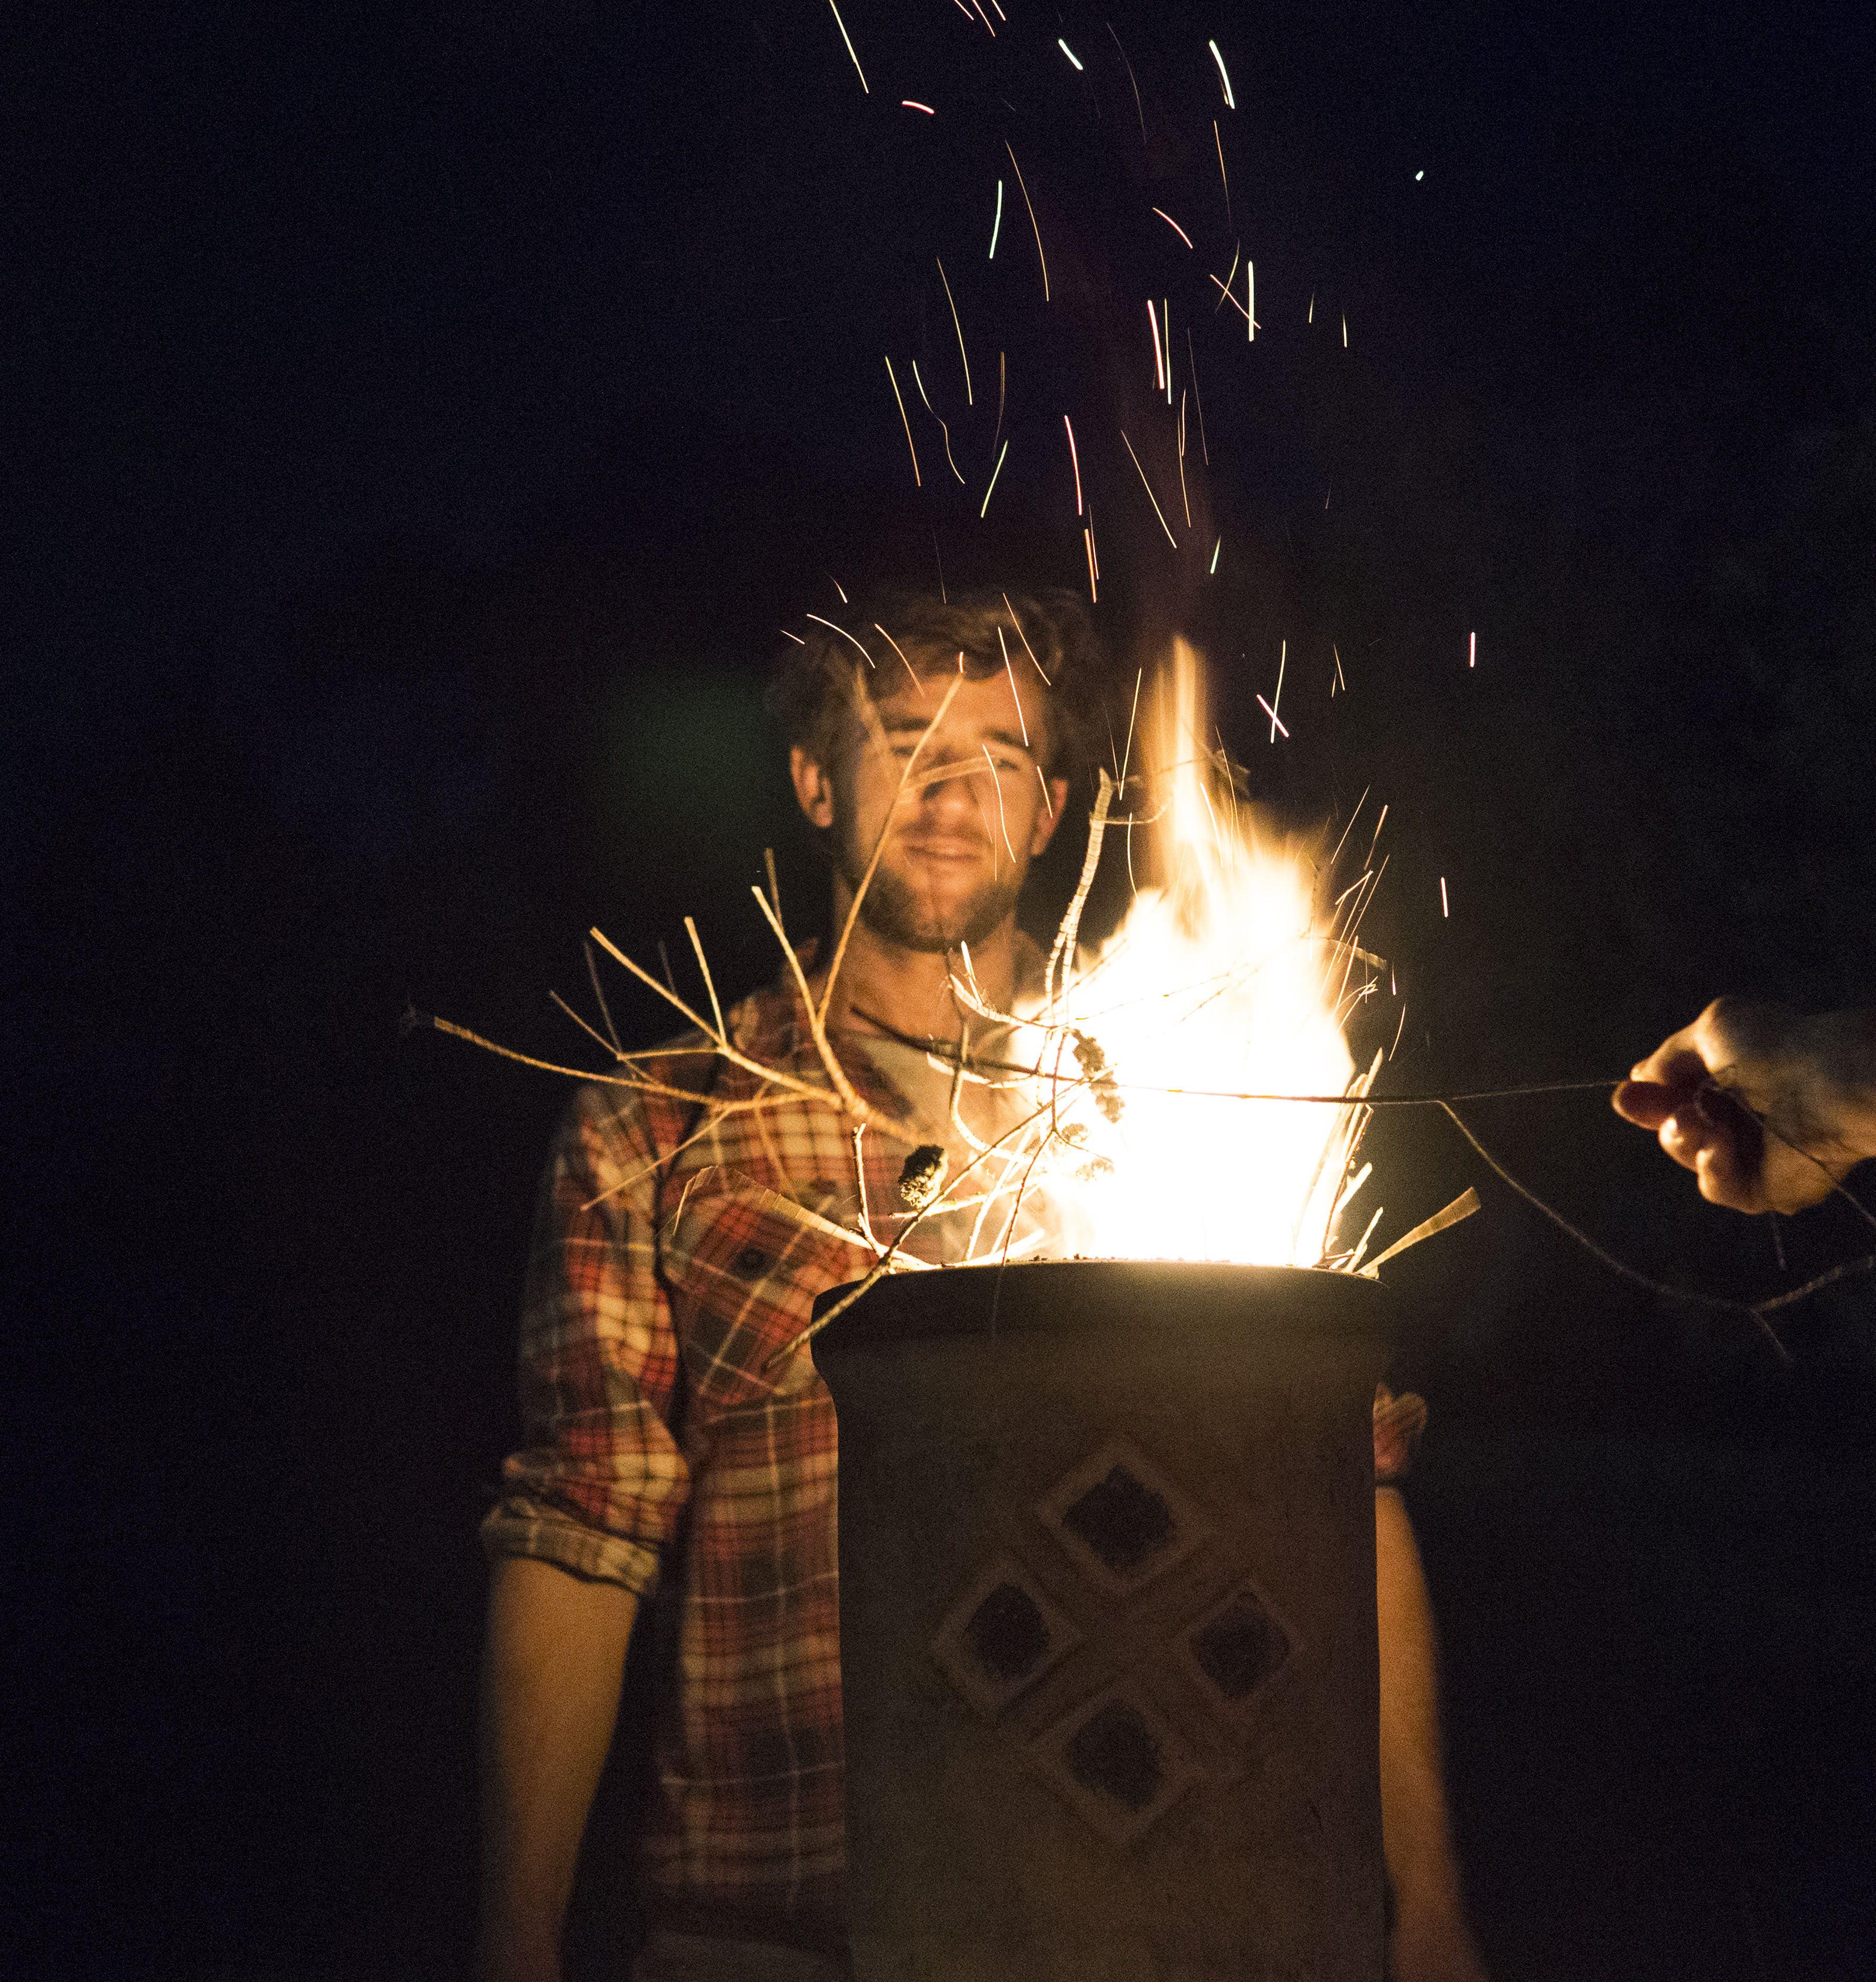 Burning Woods in the Dark